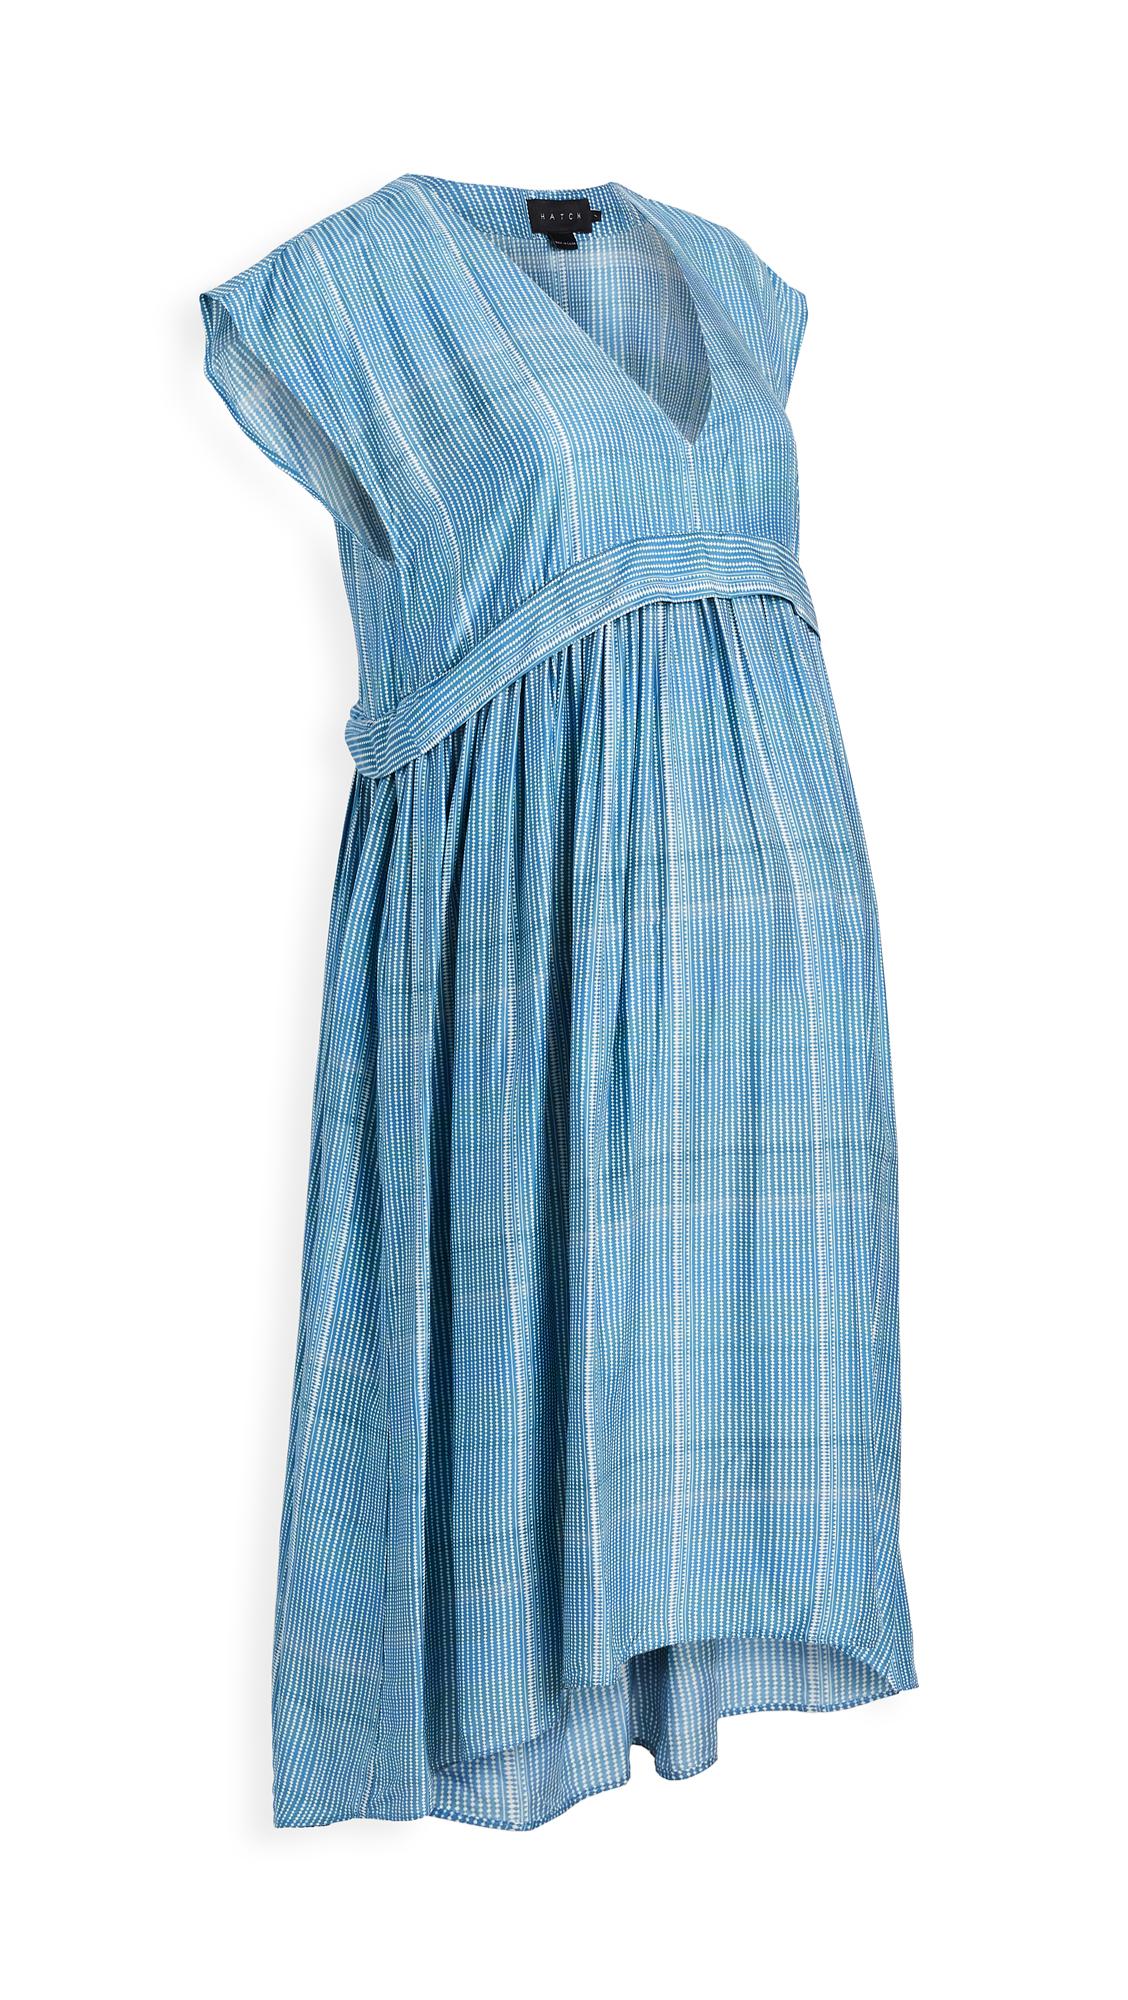 HATCH The Paulina Dress - 30% Off Sale